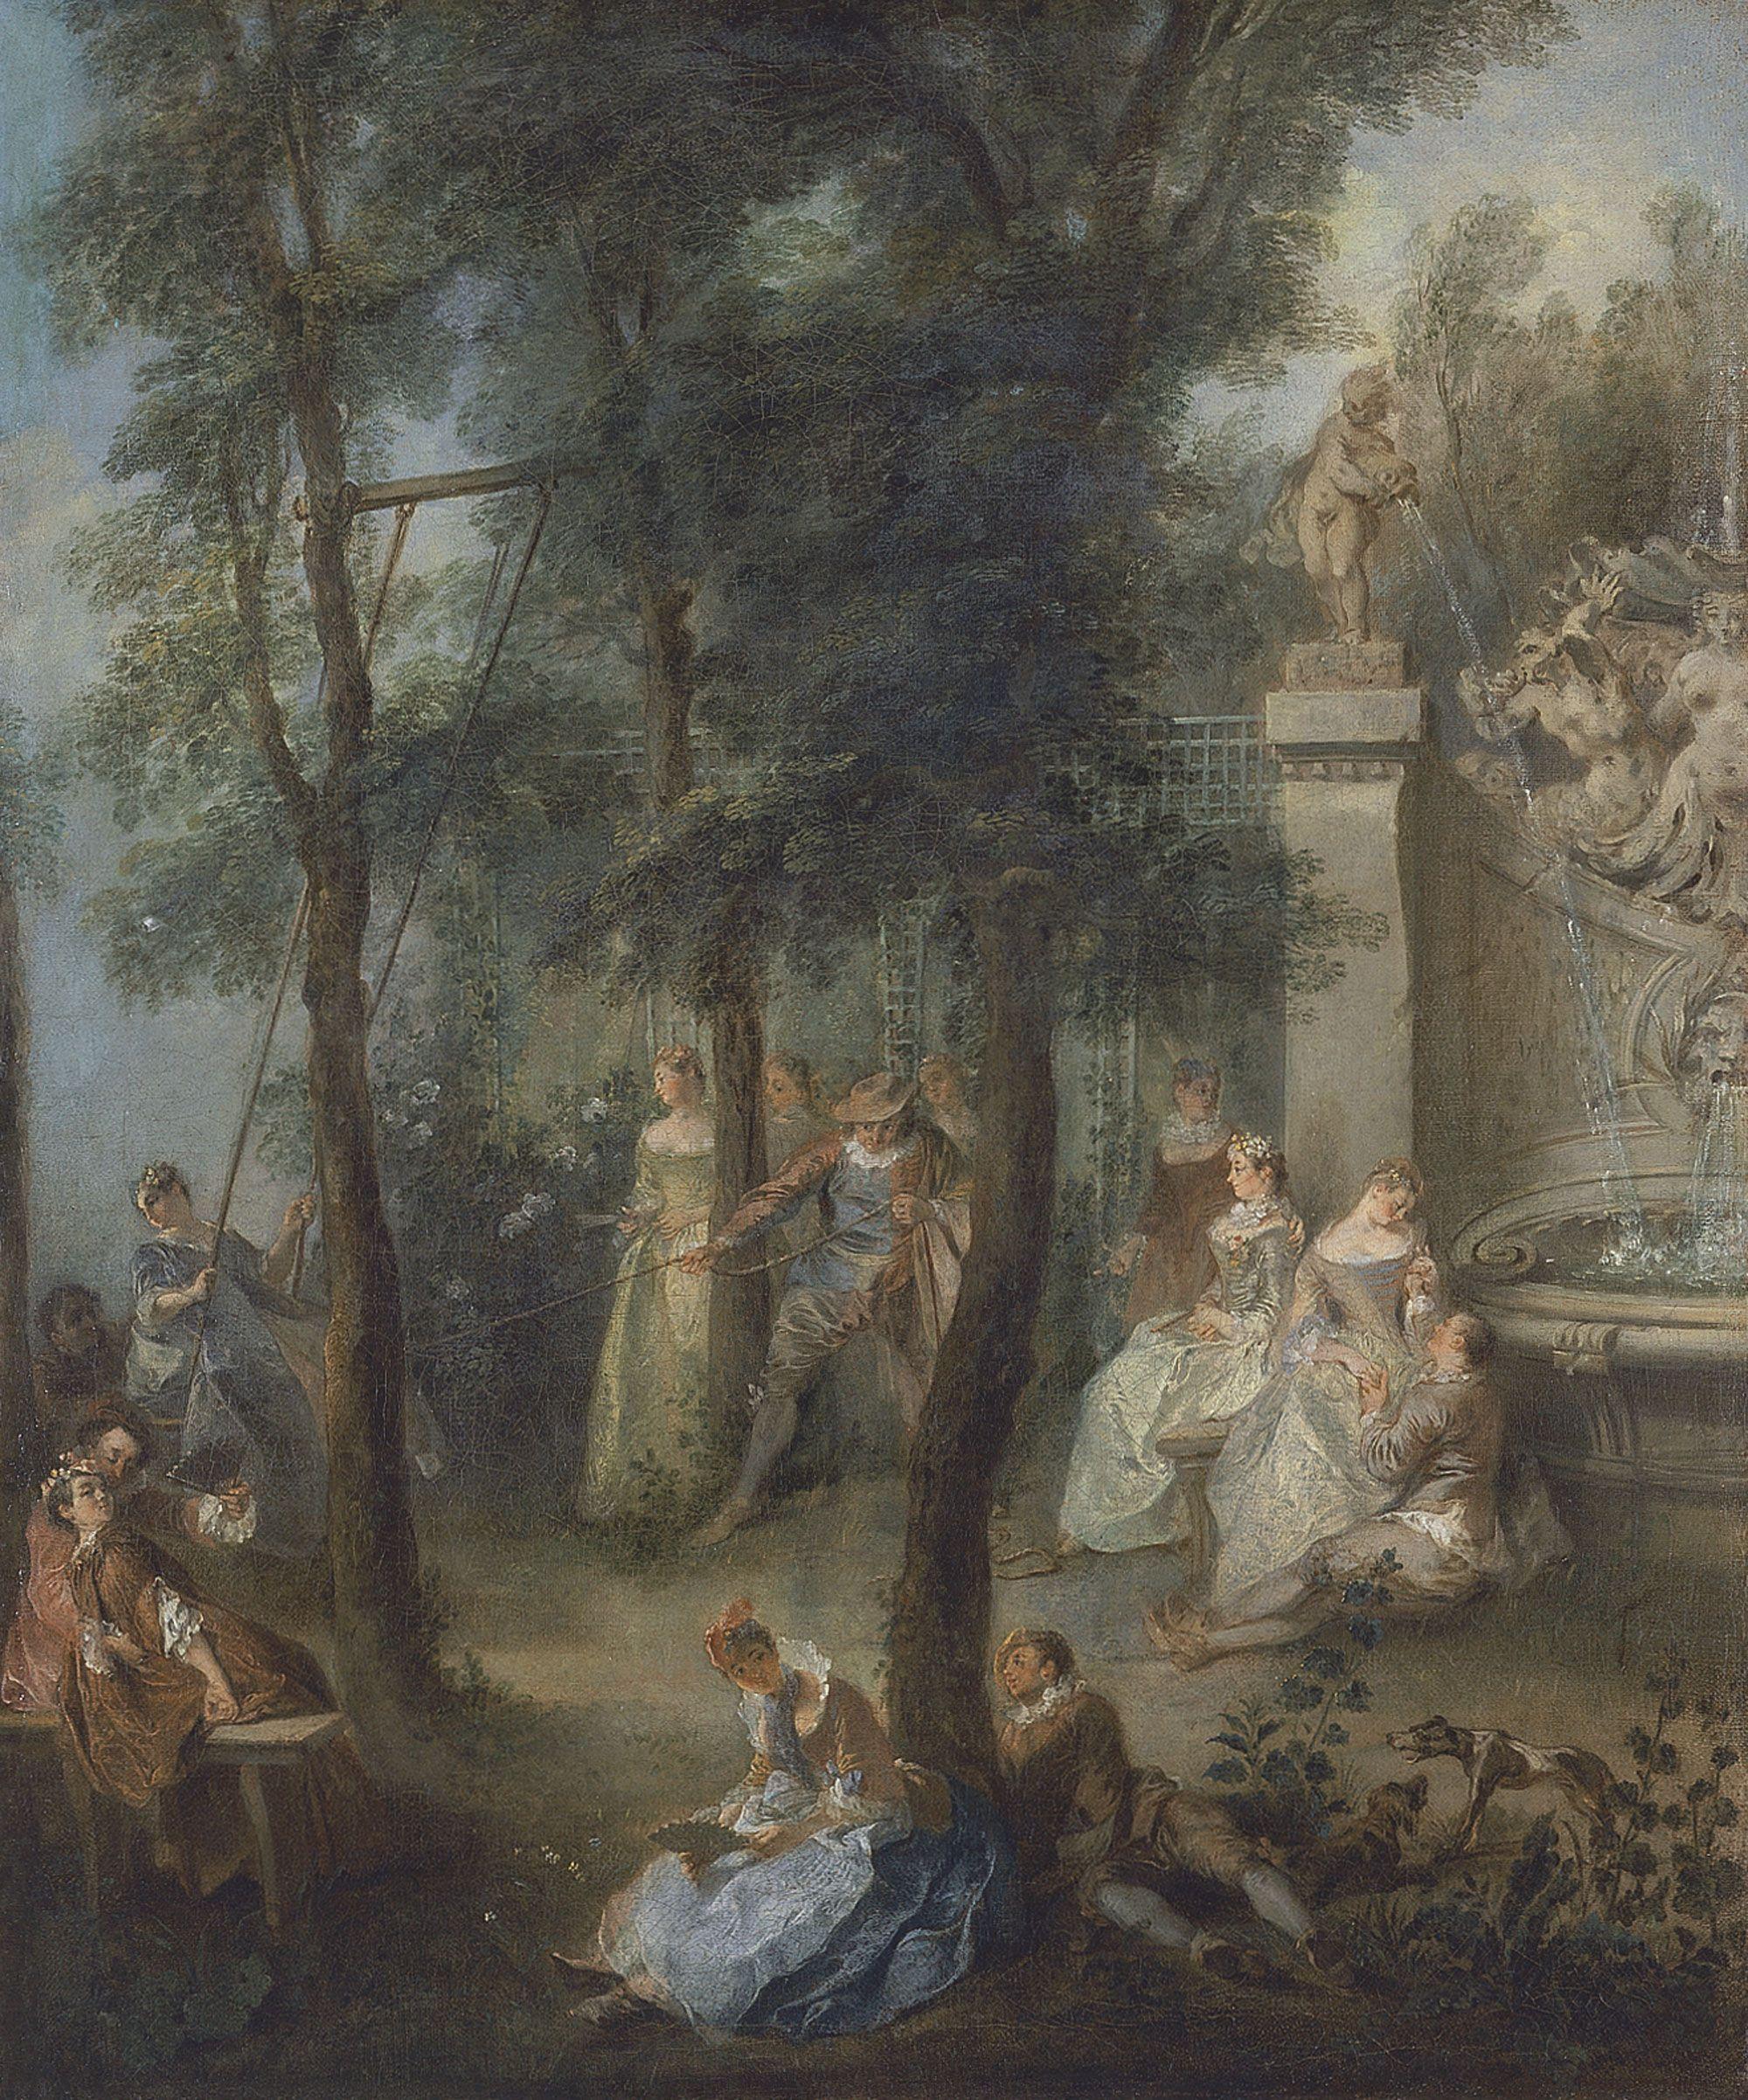 Nicolas Lancret, The Swing, ca. 1735-40 (Museo Thyssen-Bornemisza)